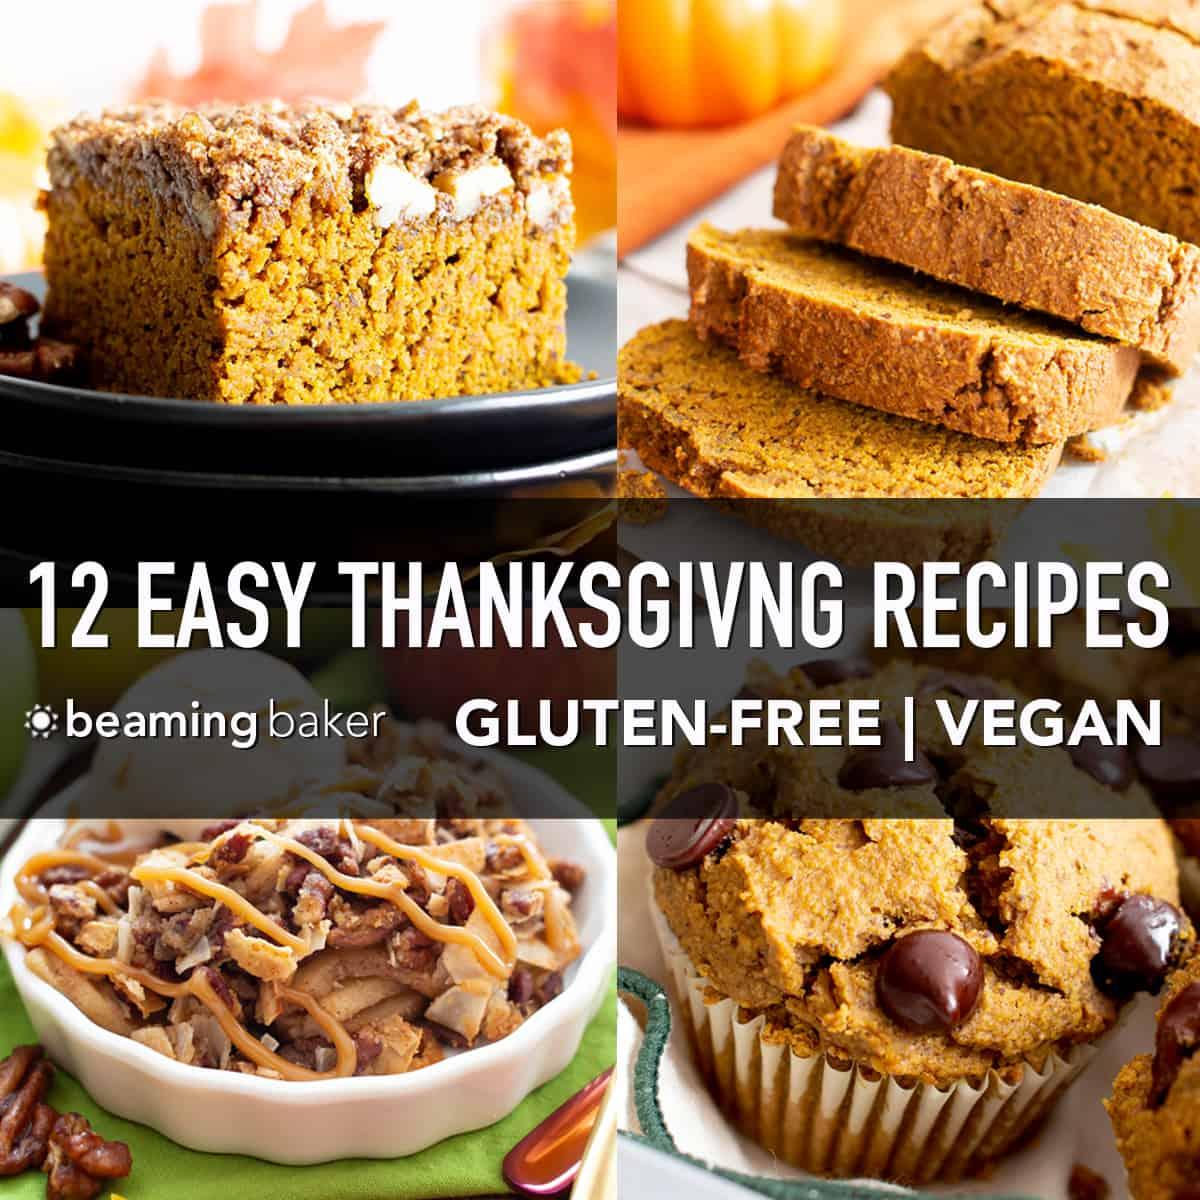 12 Easy Vegan Thanksgiving Dessert Recipes (Gluten Free